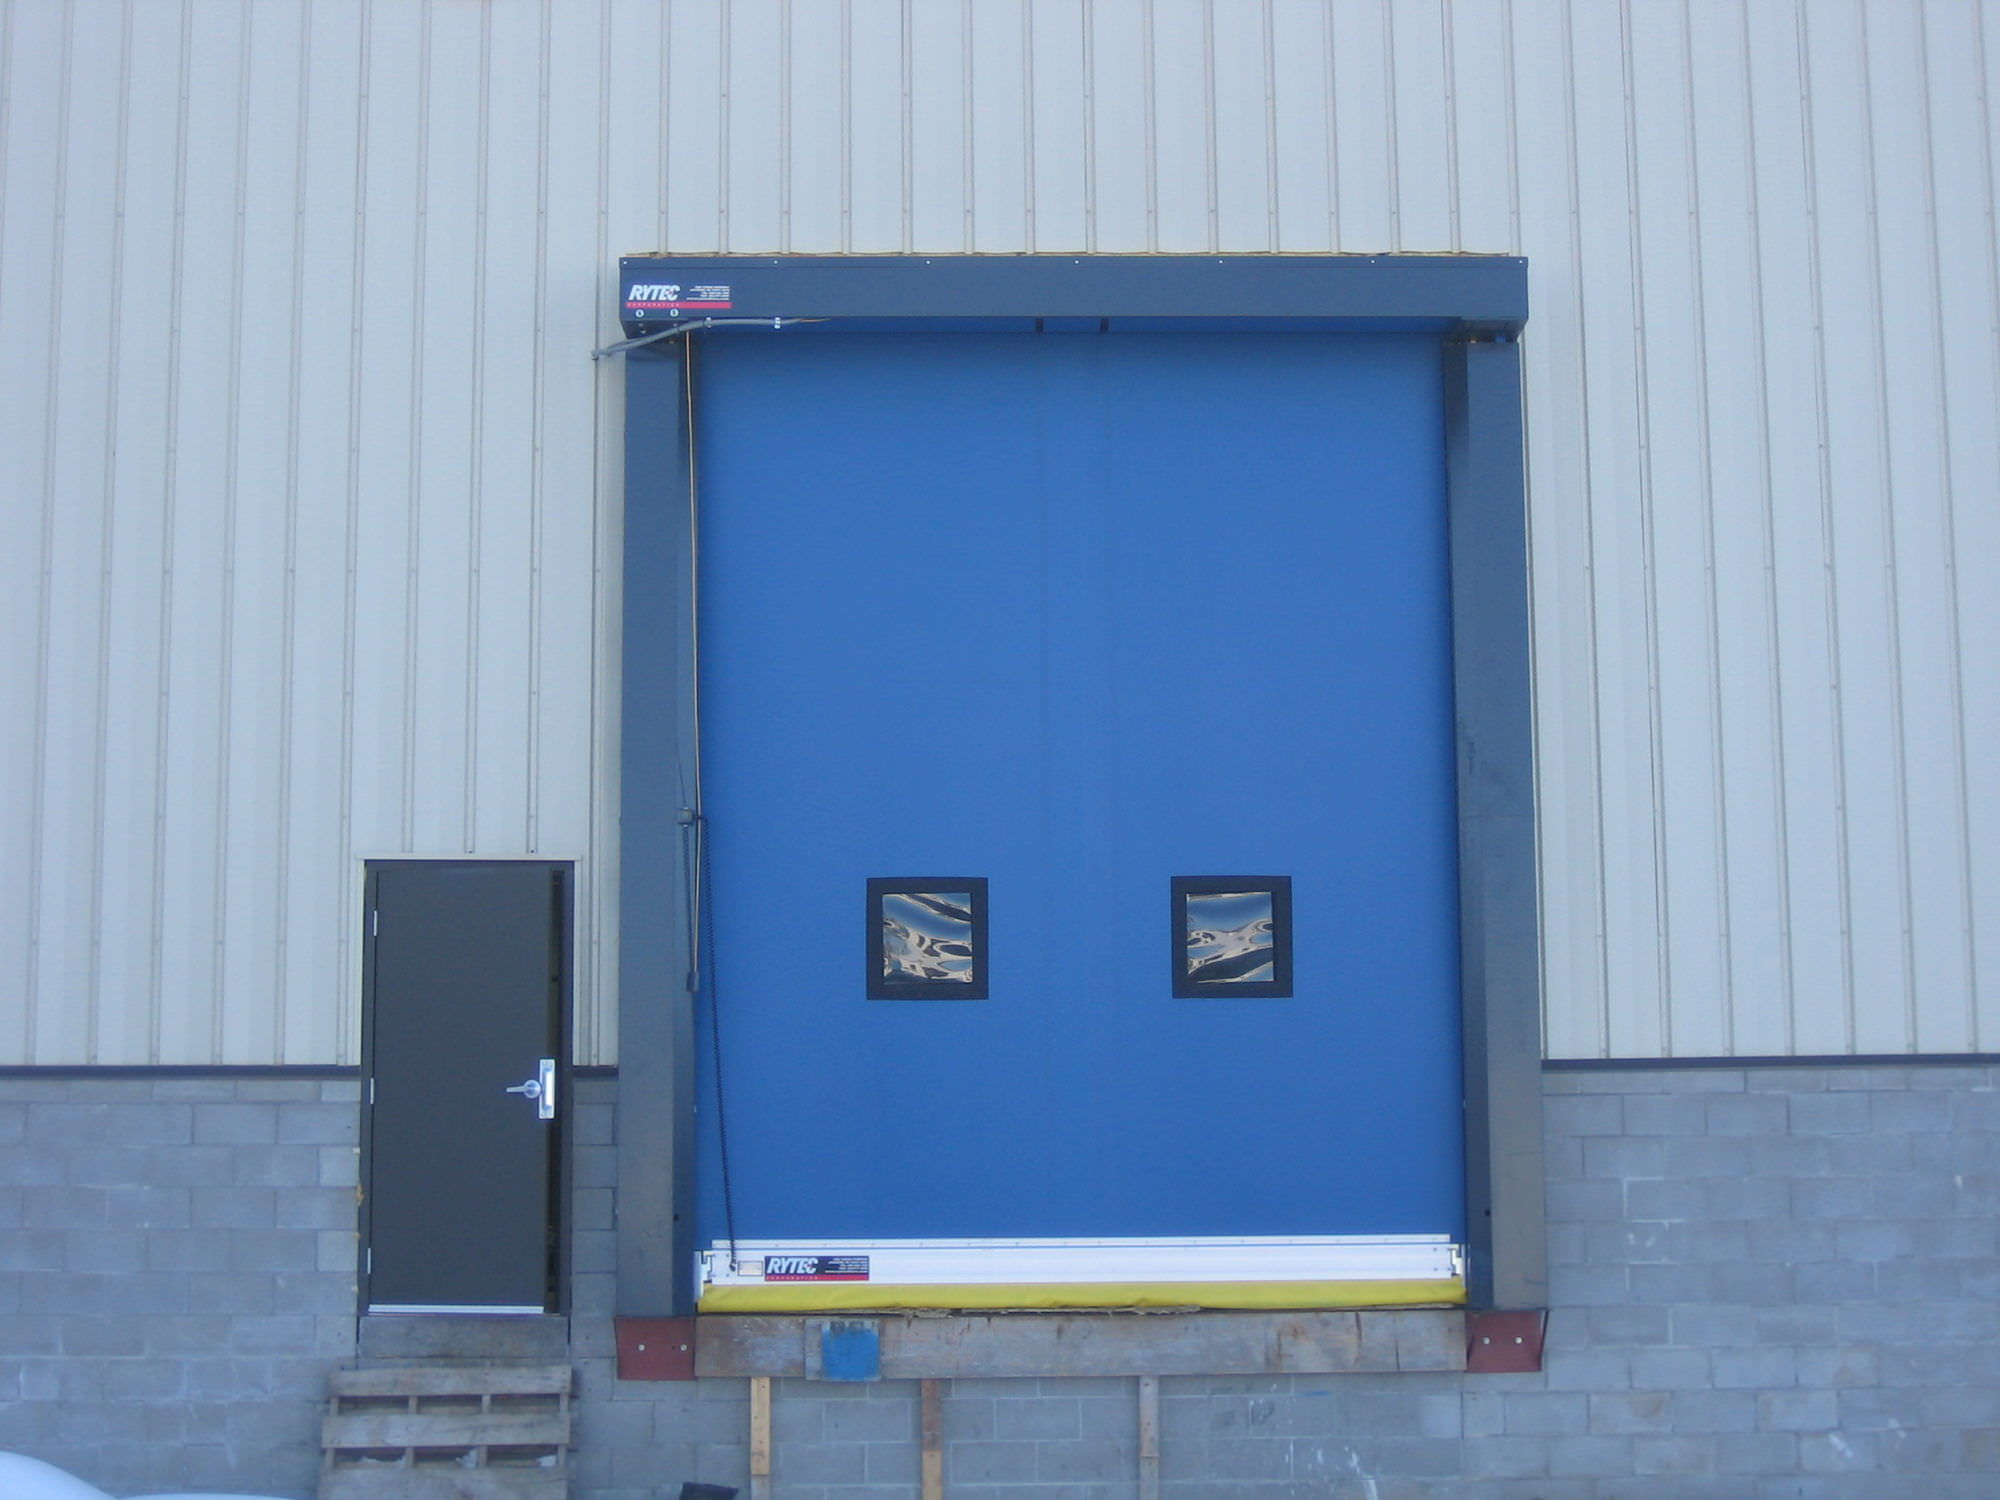 ... roll-up door / industrial / exterior / design ...  sc 1 st  DirectIndustry & Roll-up door / industrial / exterior / design - Fast-Seal® - Rytec ...